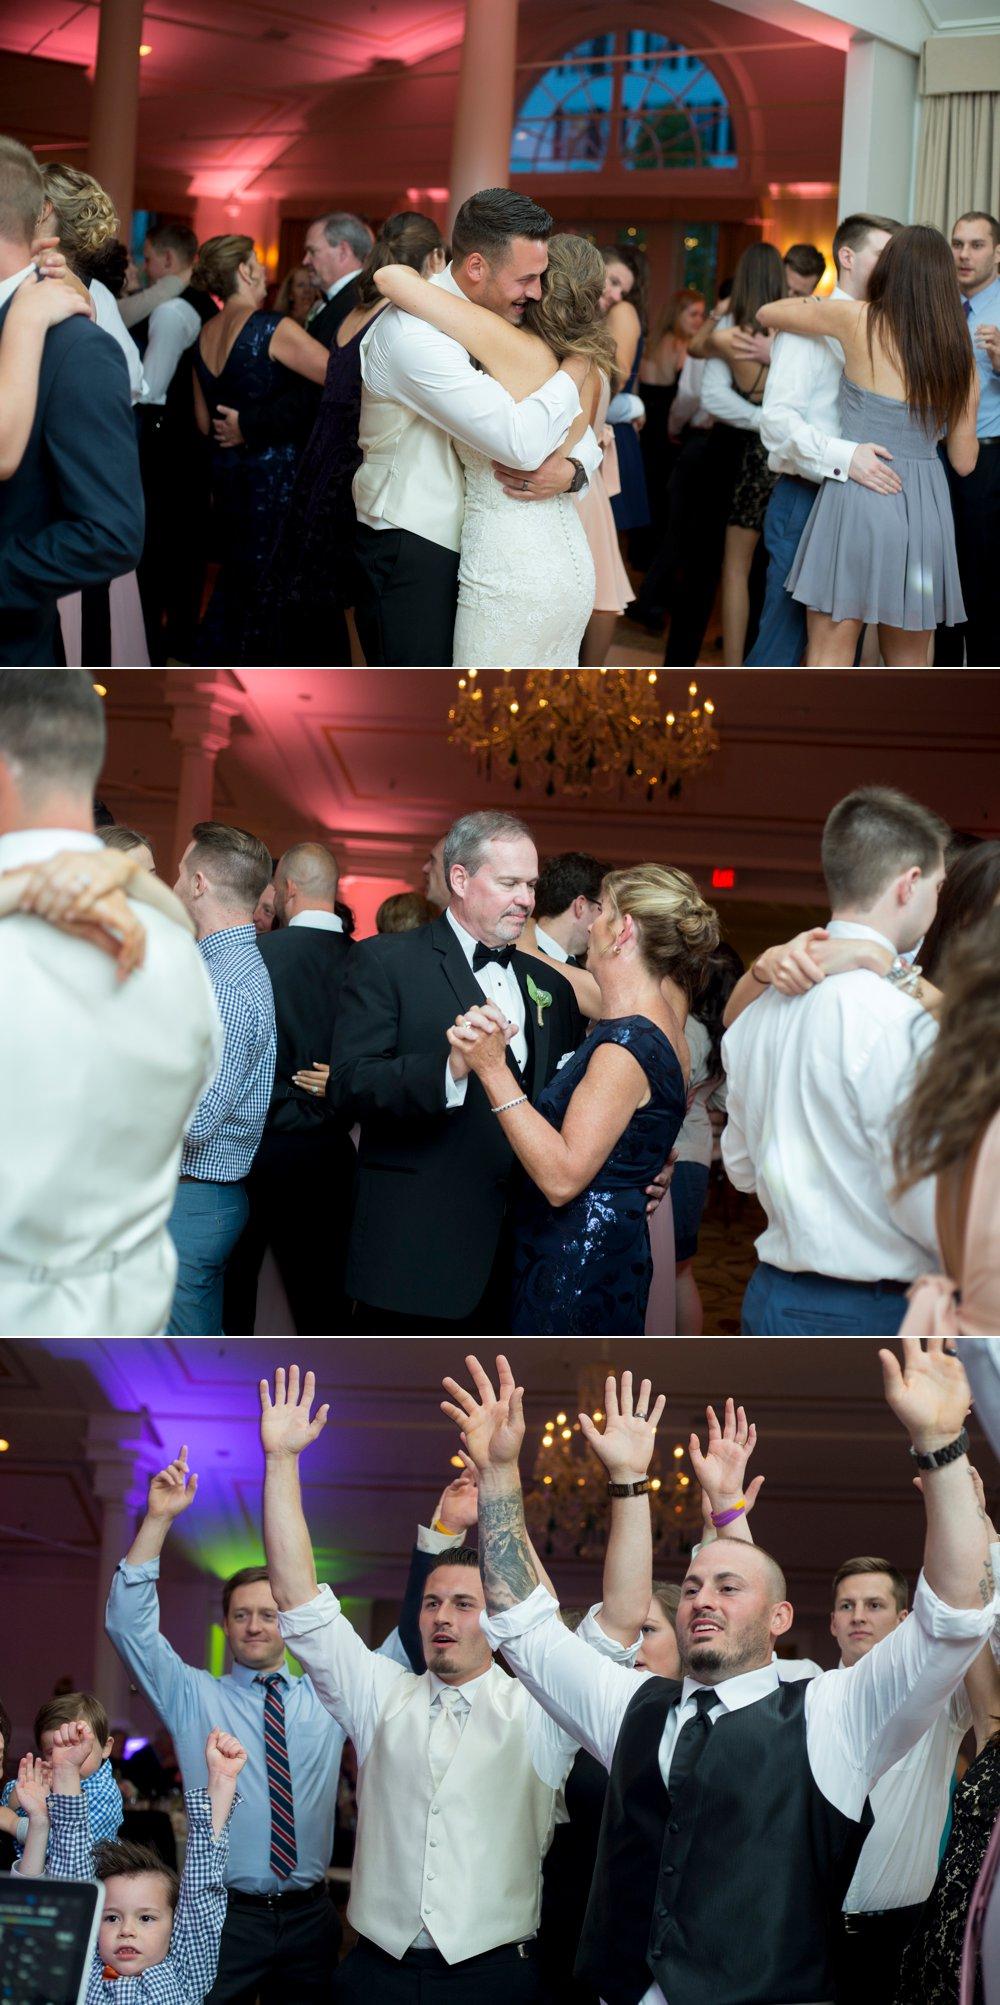 SomerbyJonesPhotography_EquinoxVermont_Wedding_0056.jpg